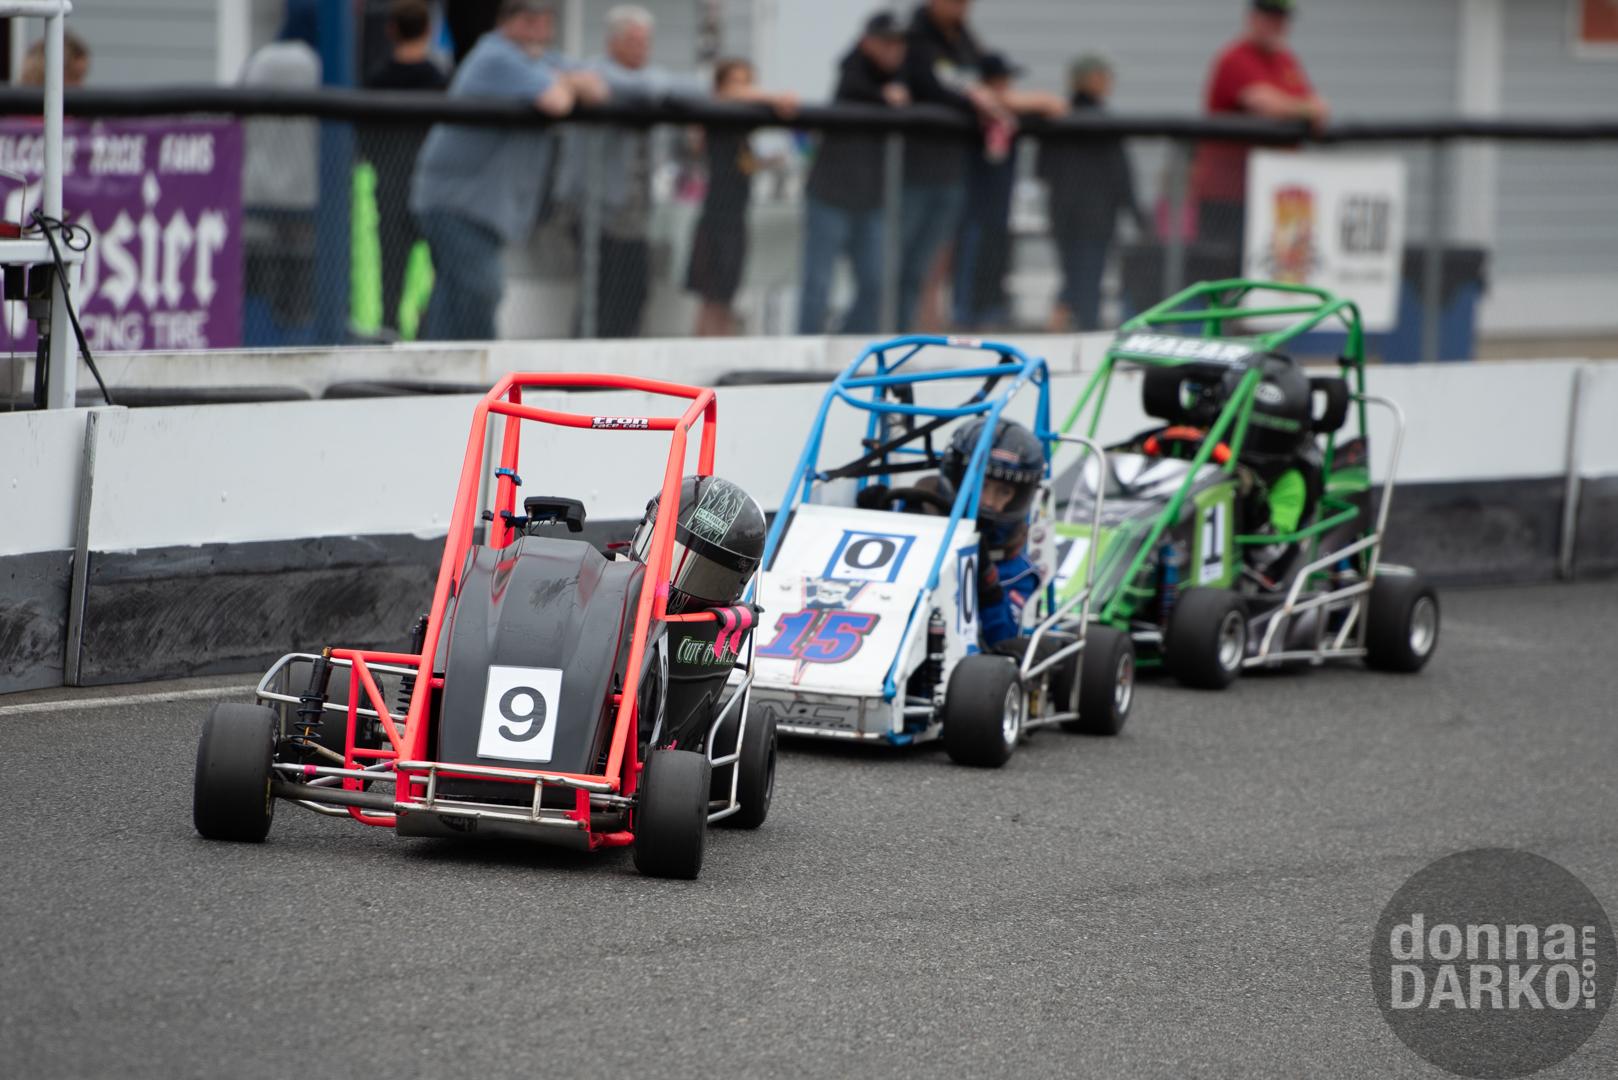 QWMA (Racing) 8-11-2019 DSC_6261.jpg